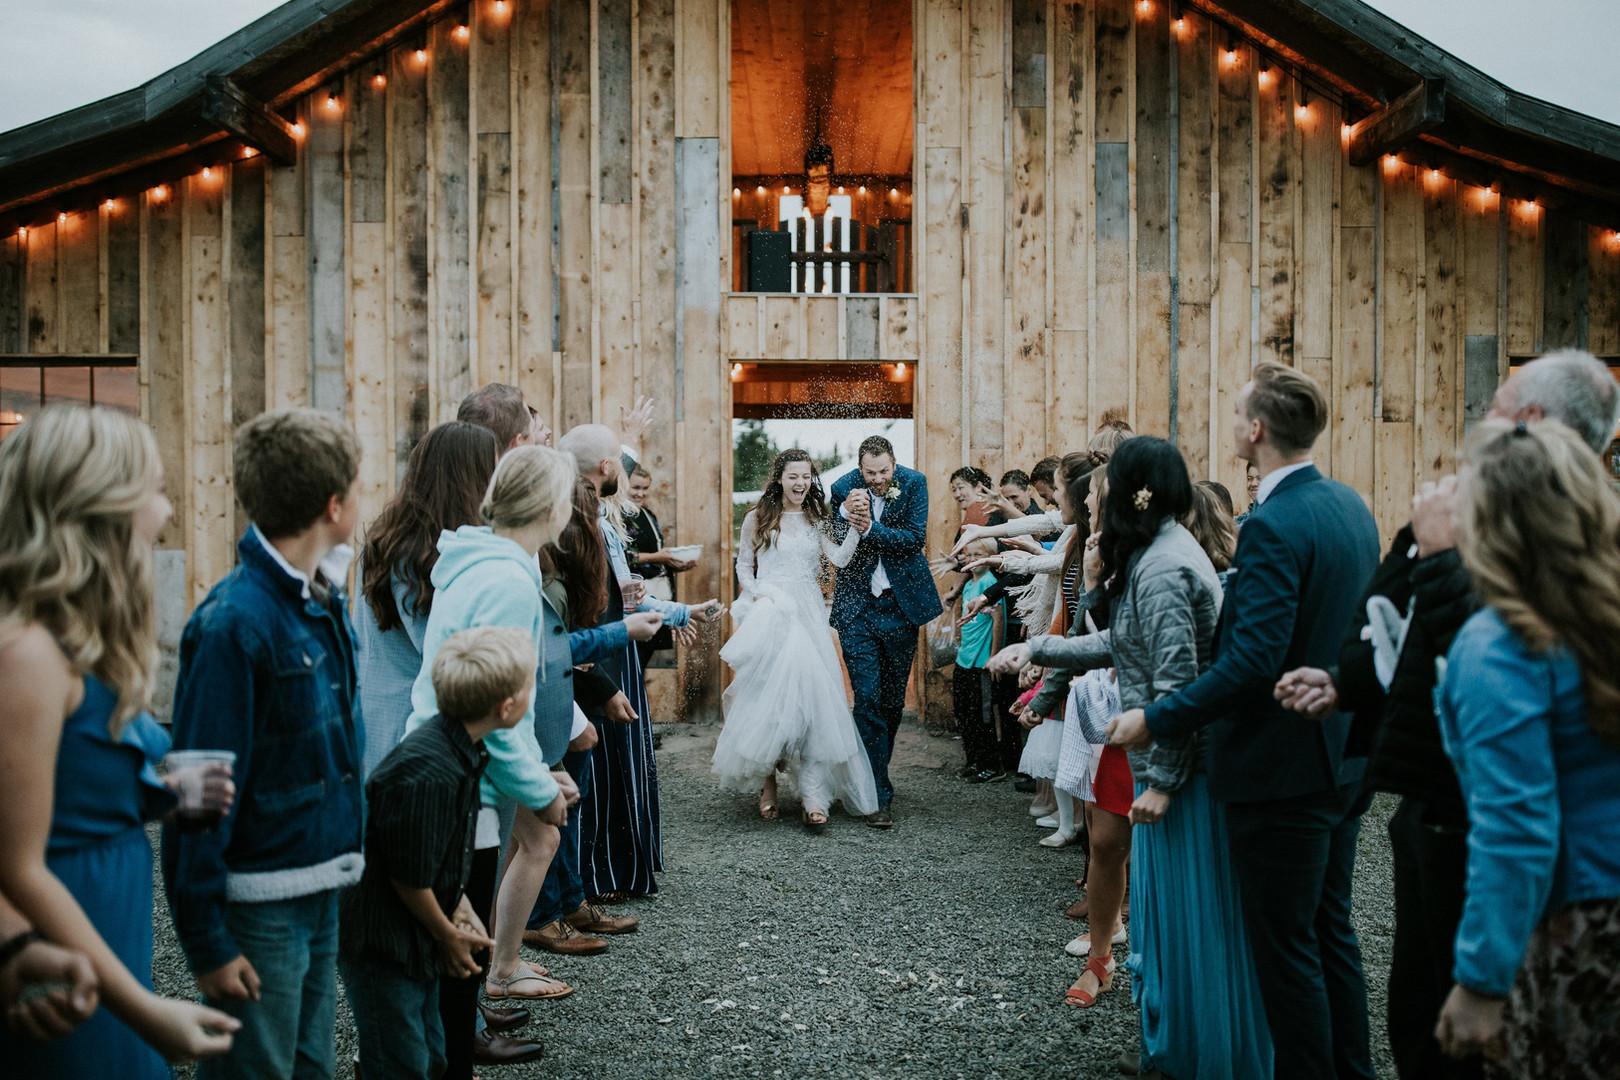 Bride and Groom wedding send off at Heritage Barn